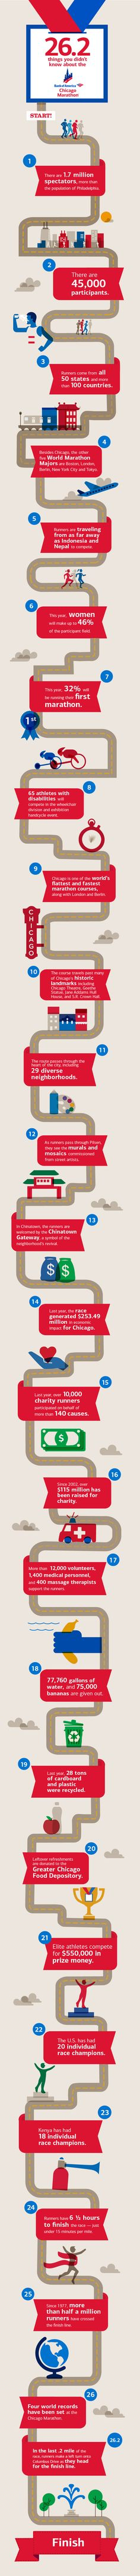 2013 Chicago Marathon Infographic